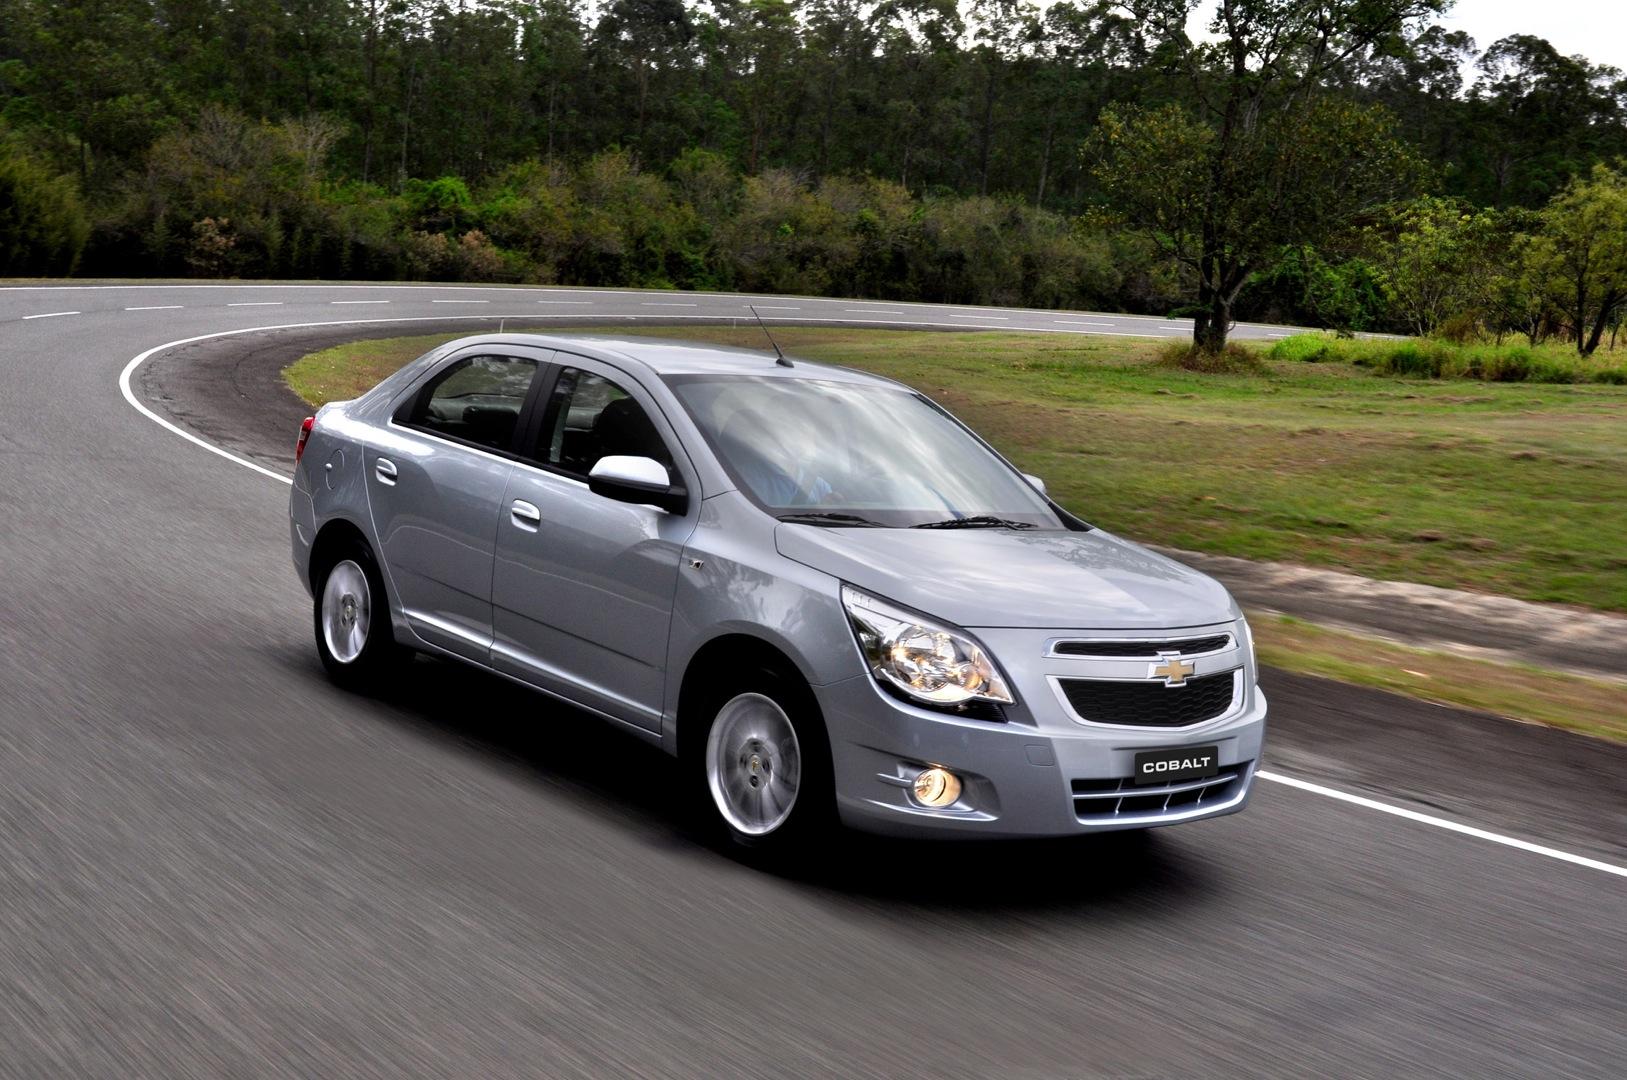 2013 Chevy Cruze For Sale >> CHEVROLET Cobalt - 2011, 2012, 2013, 2014, 2015, 2016 - autoevolution